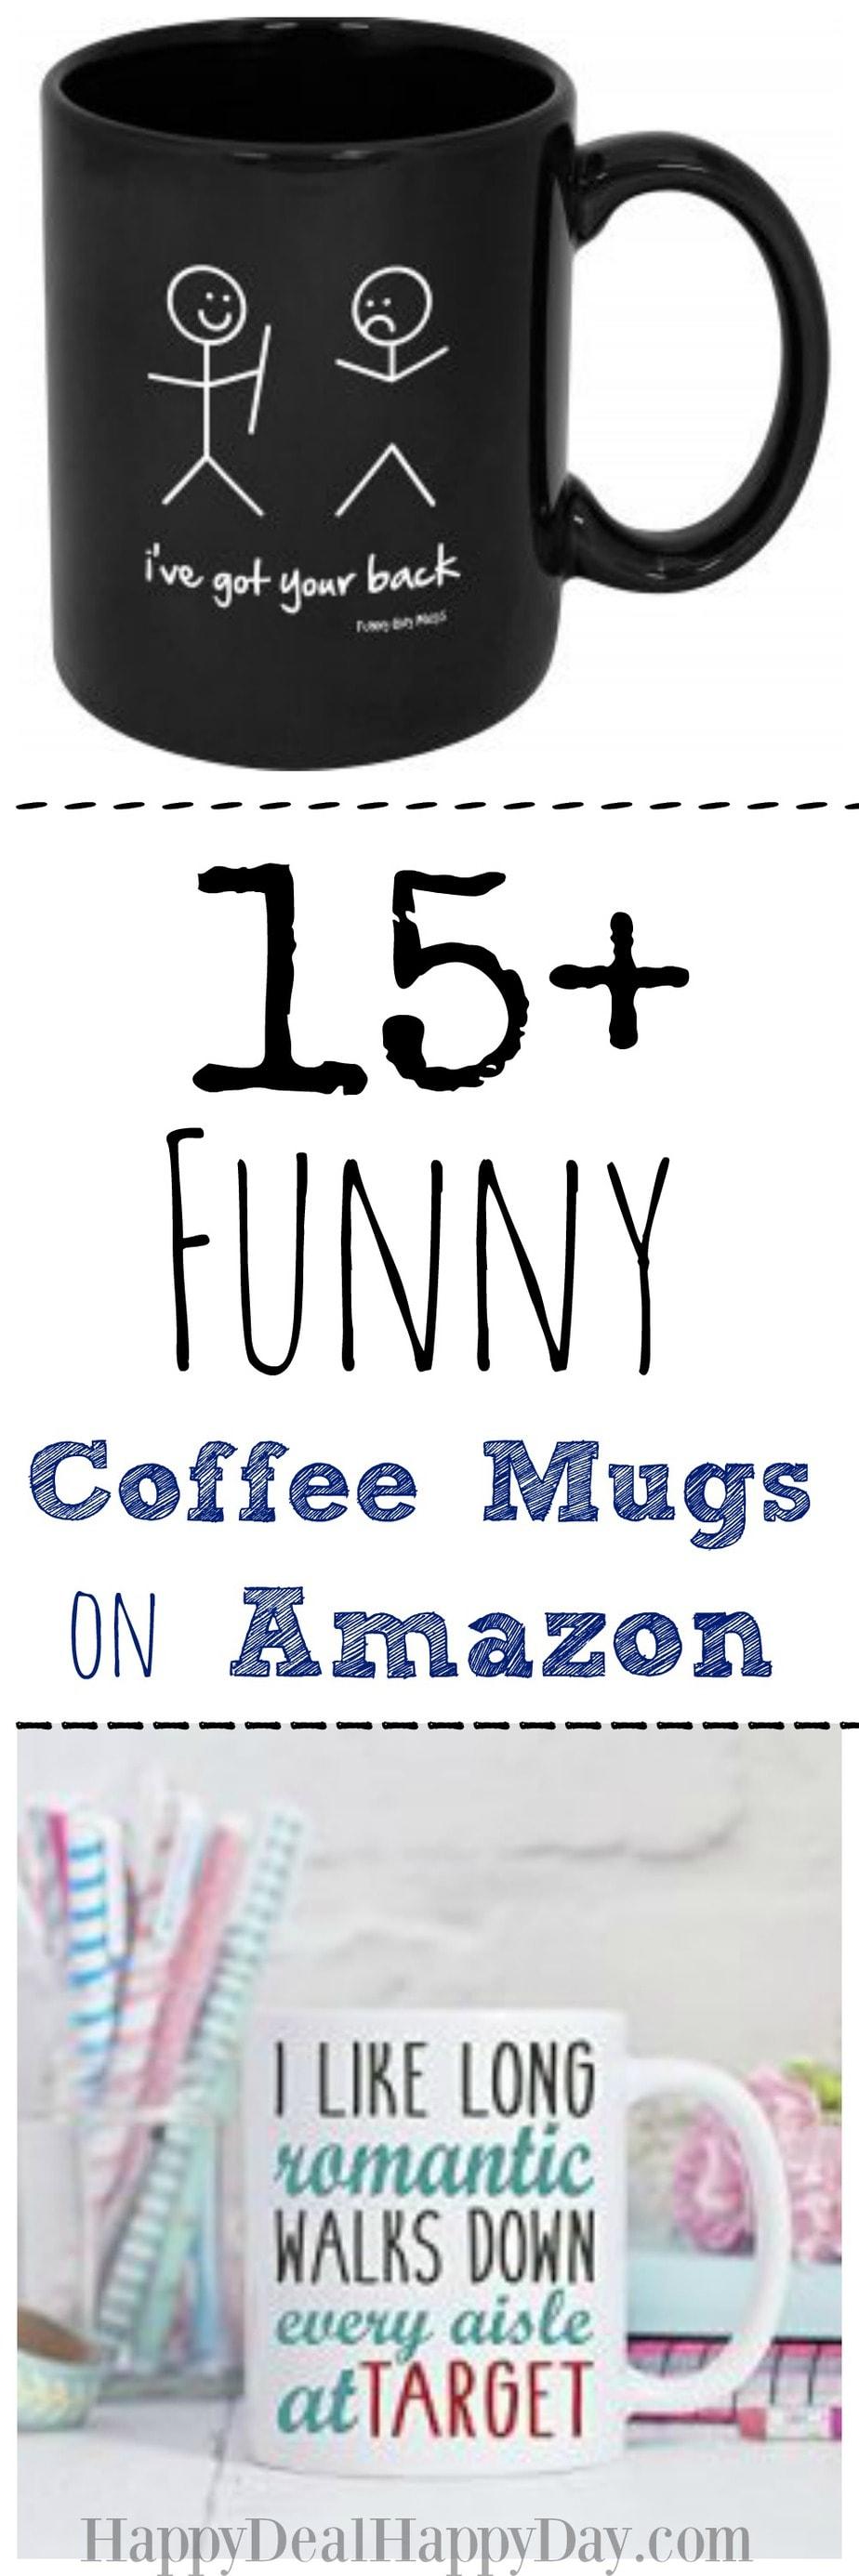 Thrifty Ny Coffee Mugs You Can Find On Amazon Ny Gifts Ny Monday Coffee S Ny S Coffee Beans Ny Coffee Mugs You Can Find On Amazon List furniture Funny Coffee Pic